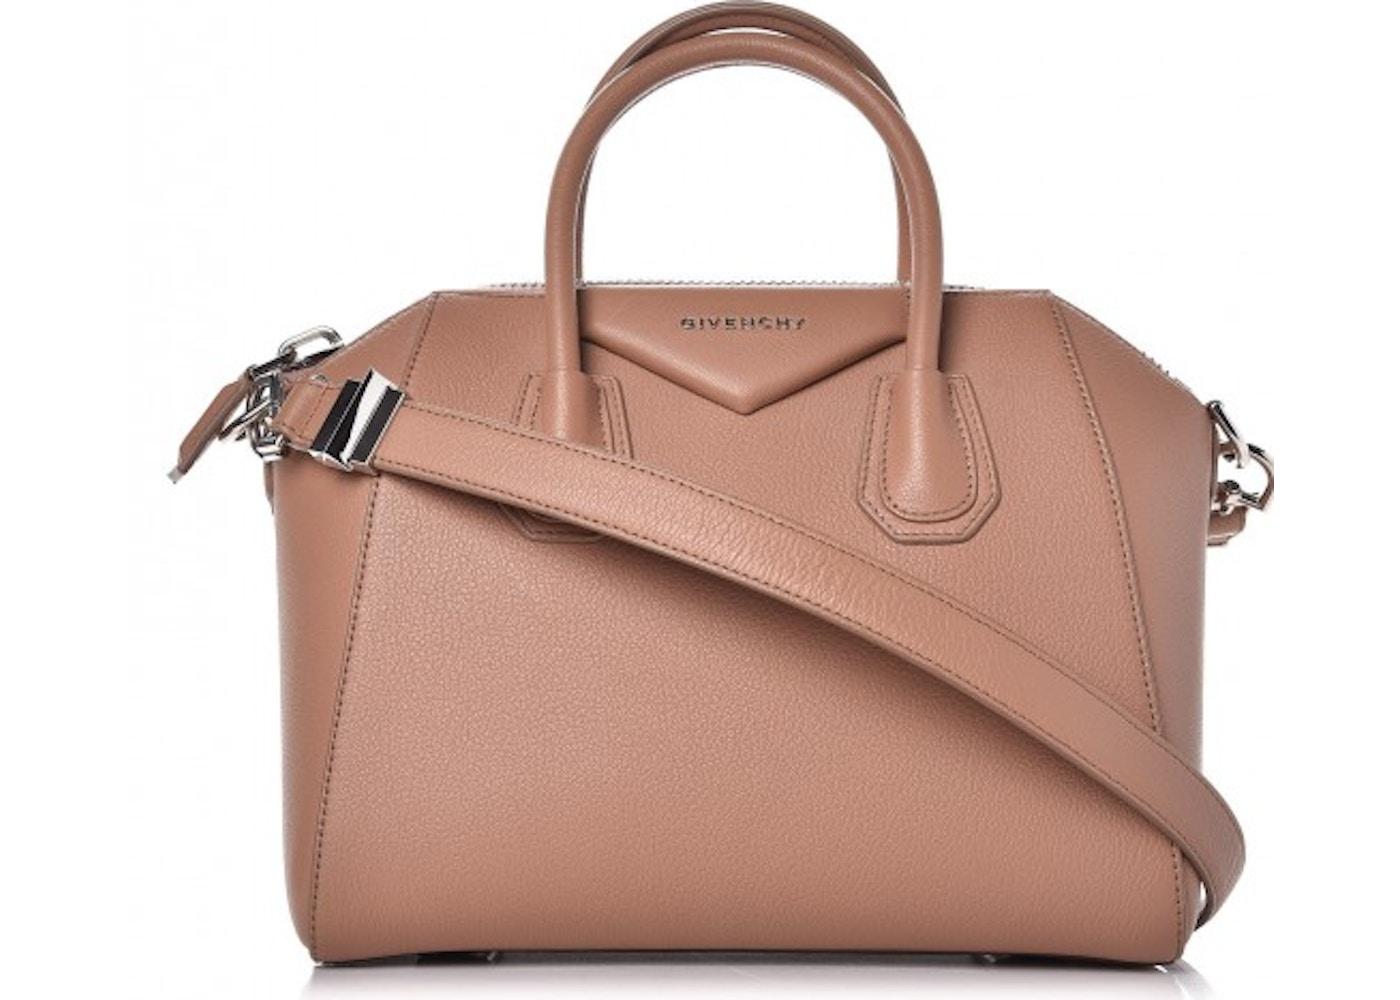 7ea258ab8e Givenchy Antigona Tote Sugar Goatskin Small Old Pink